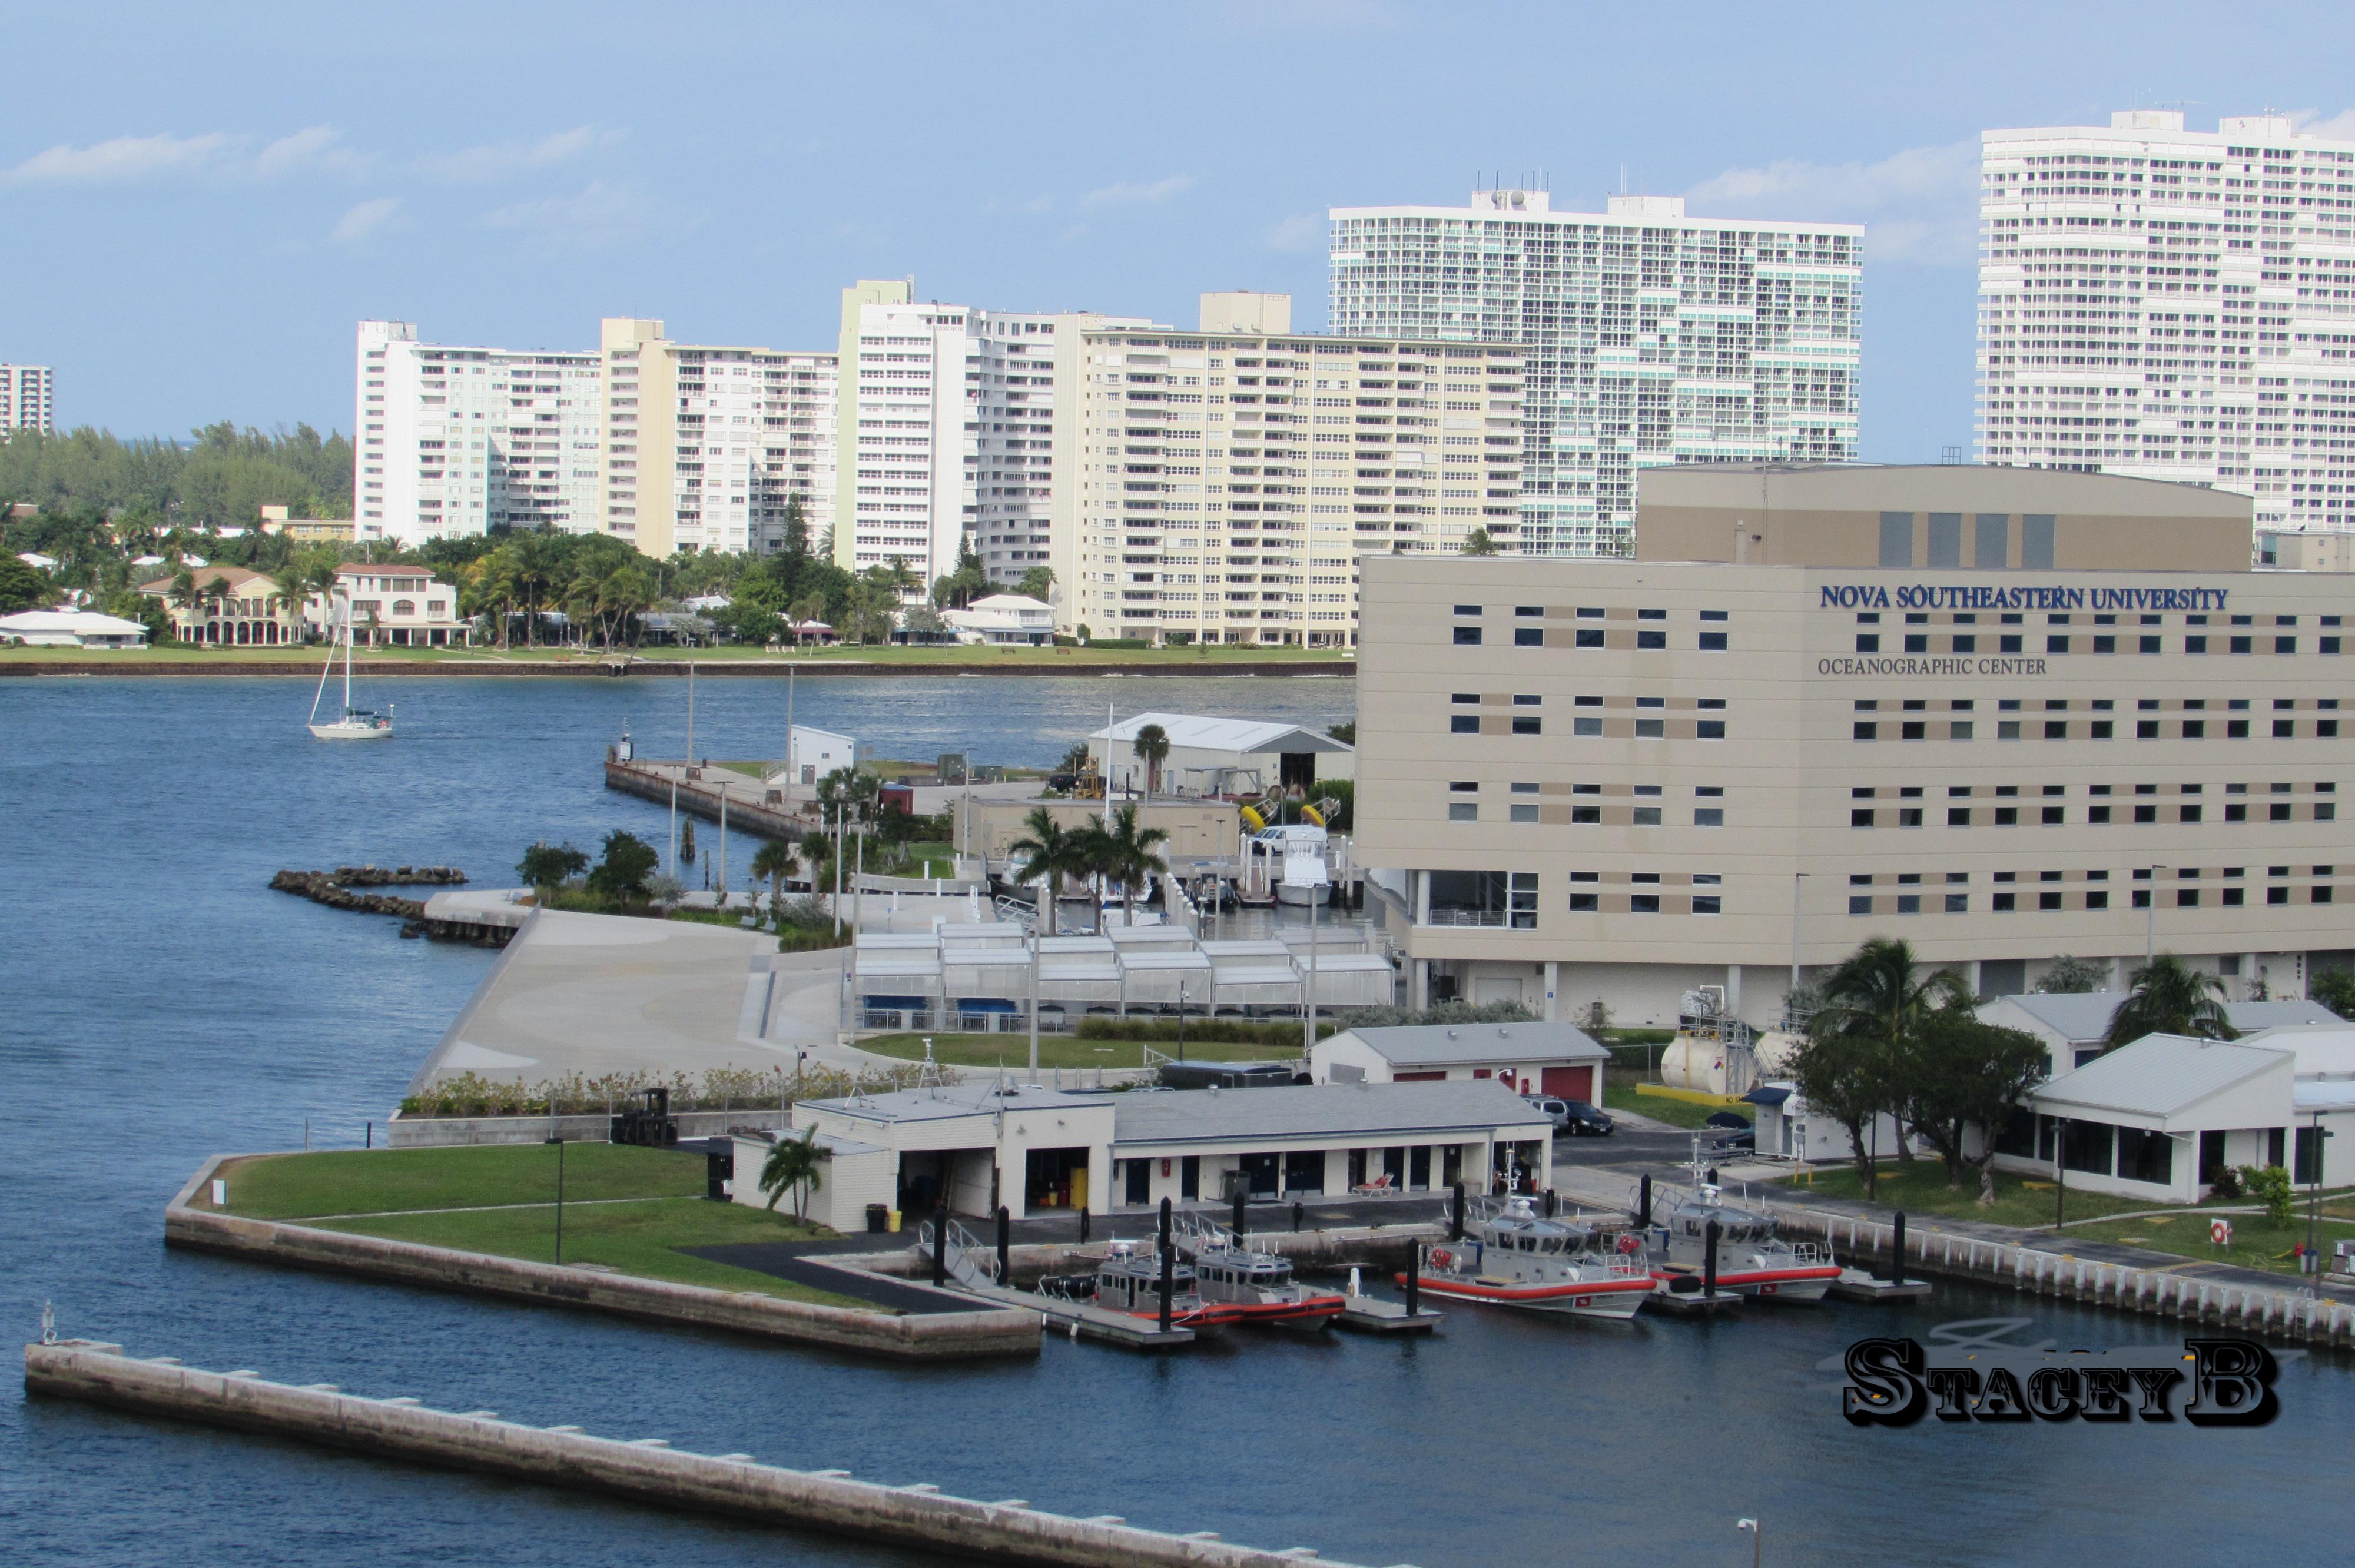 Fort Lauderdale, Fl.